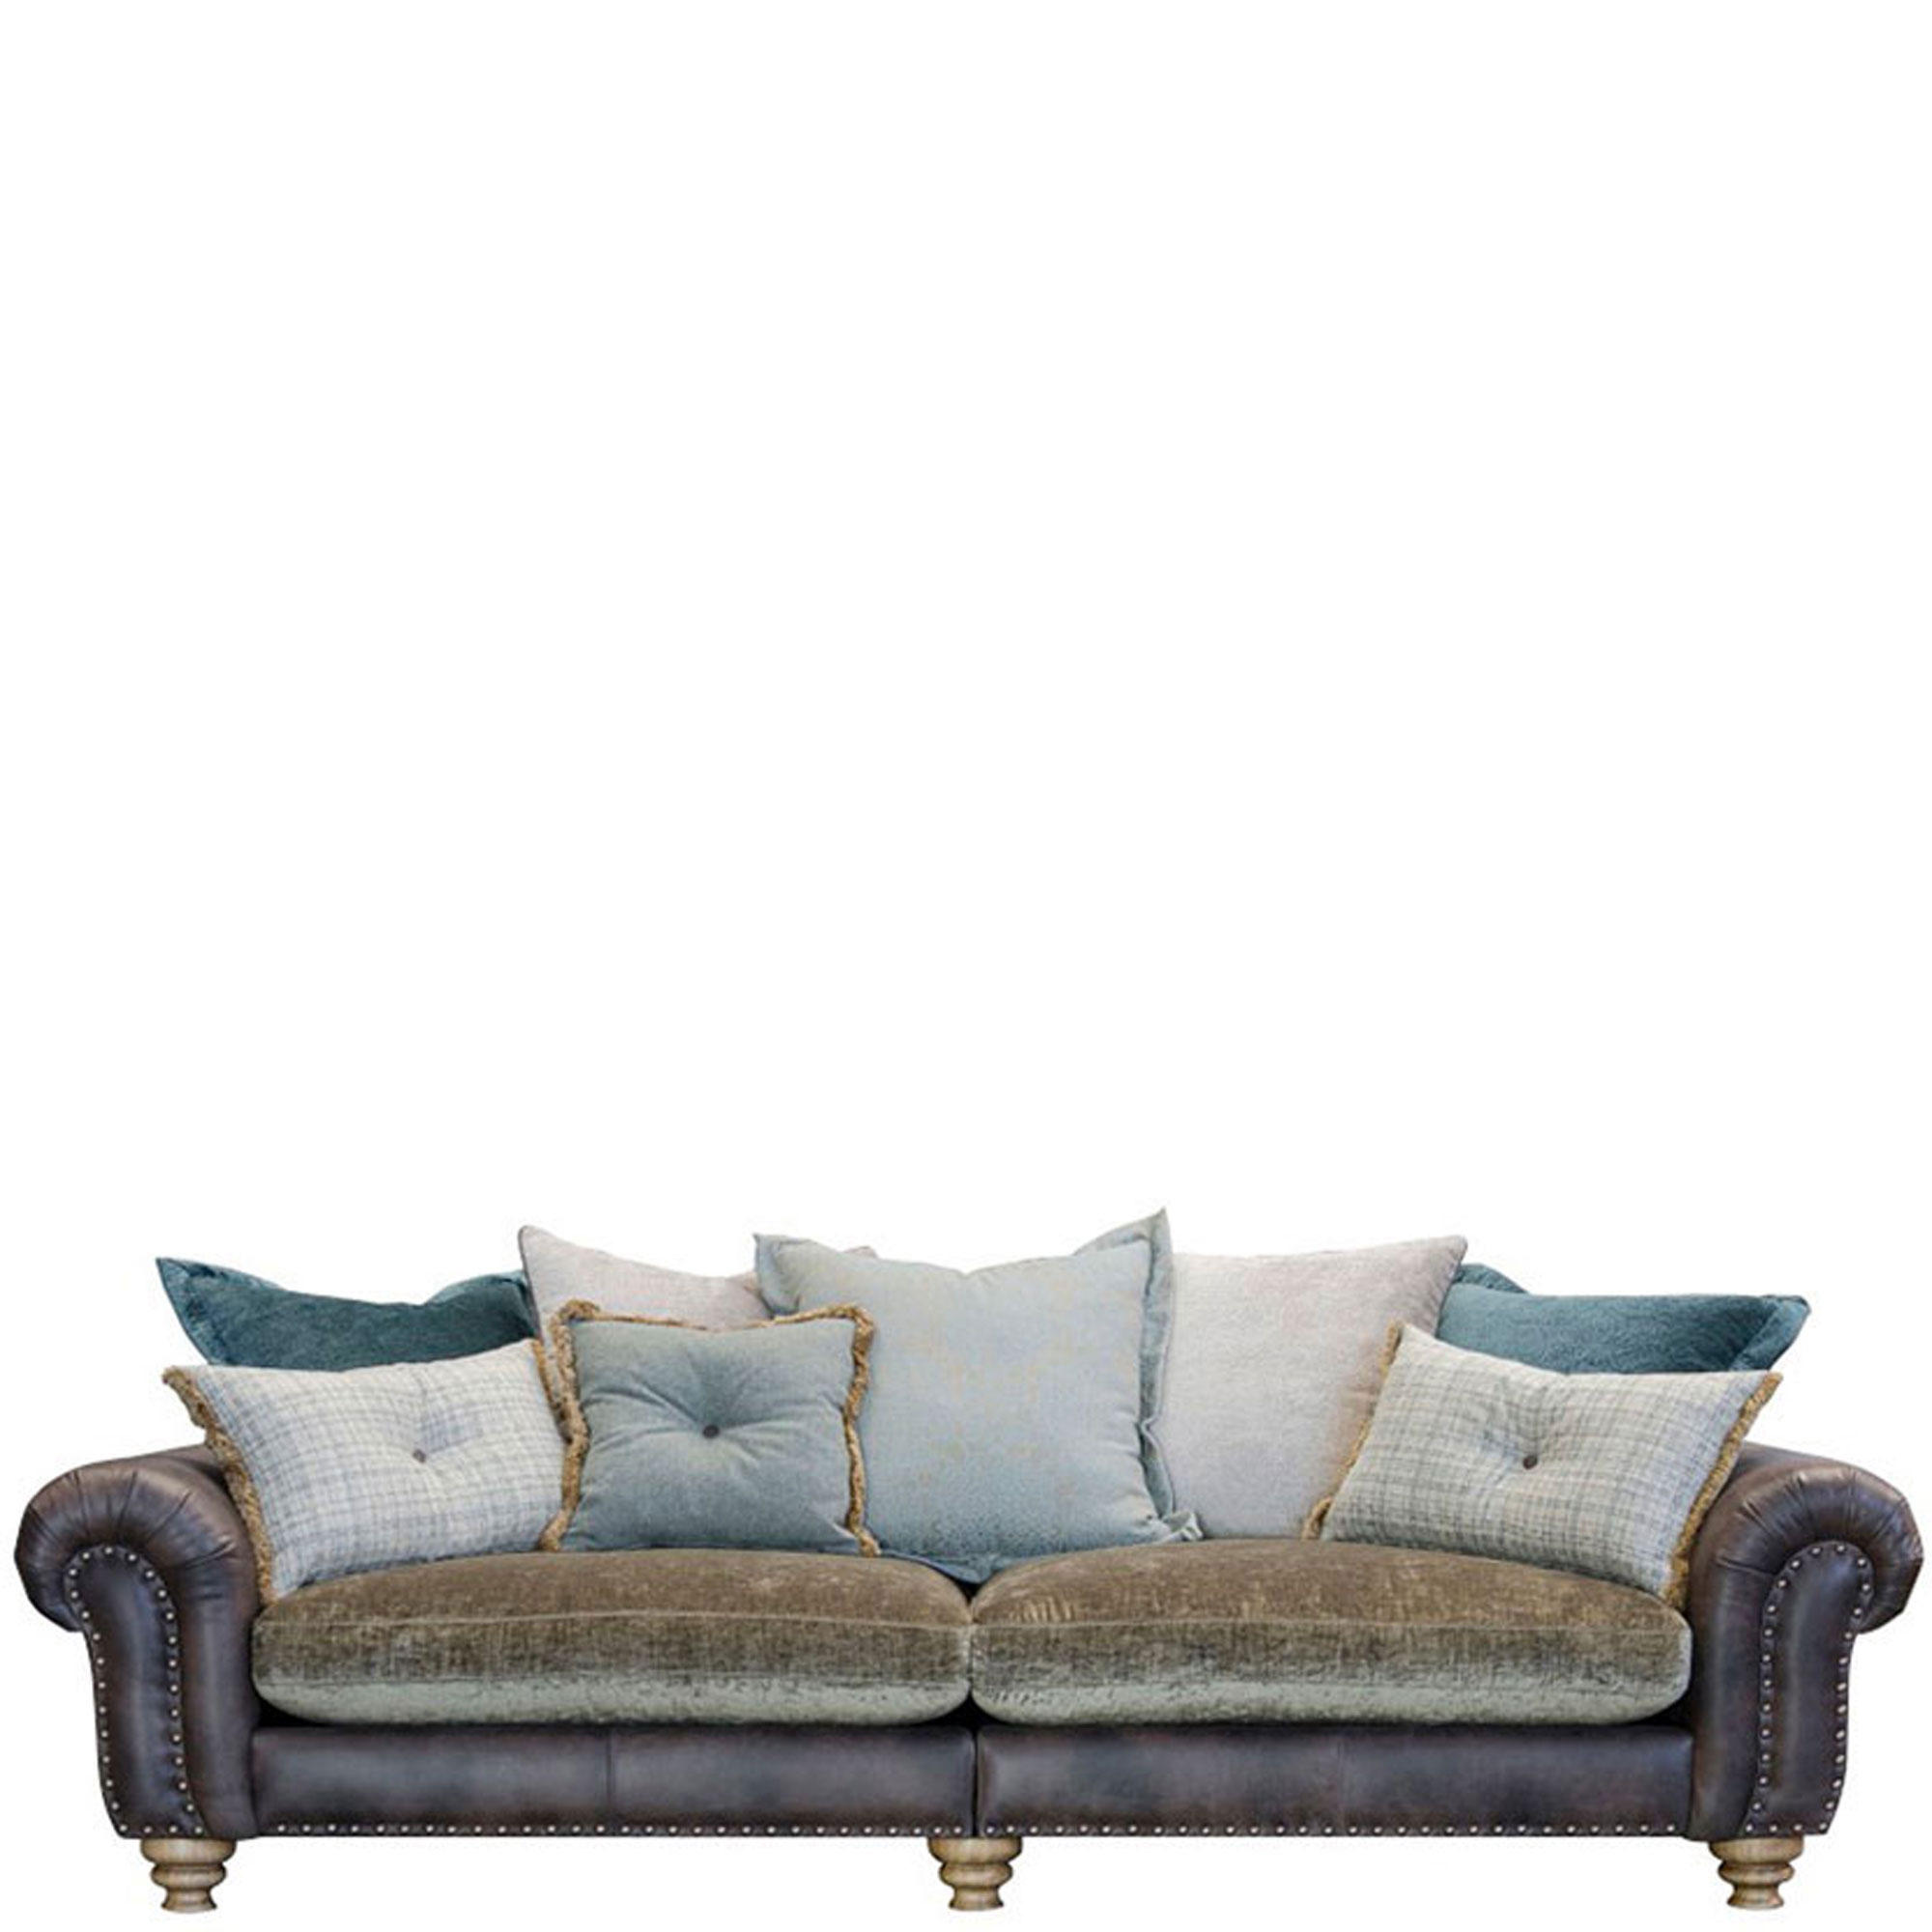 modular sofas ireland unusual throws for living home arnotts